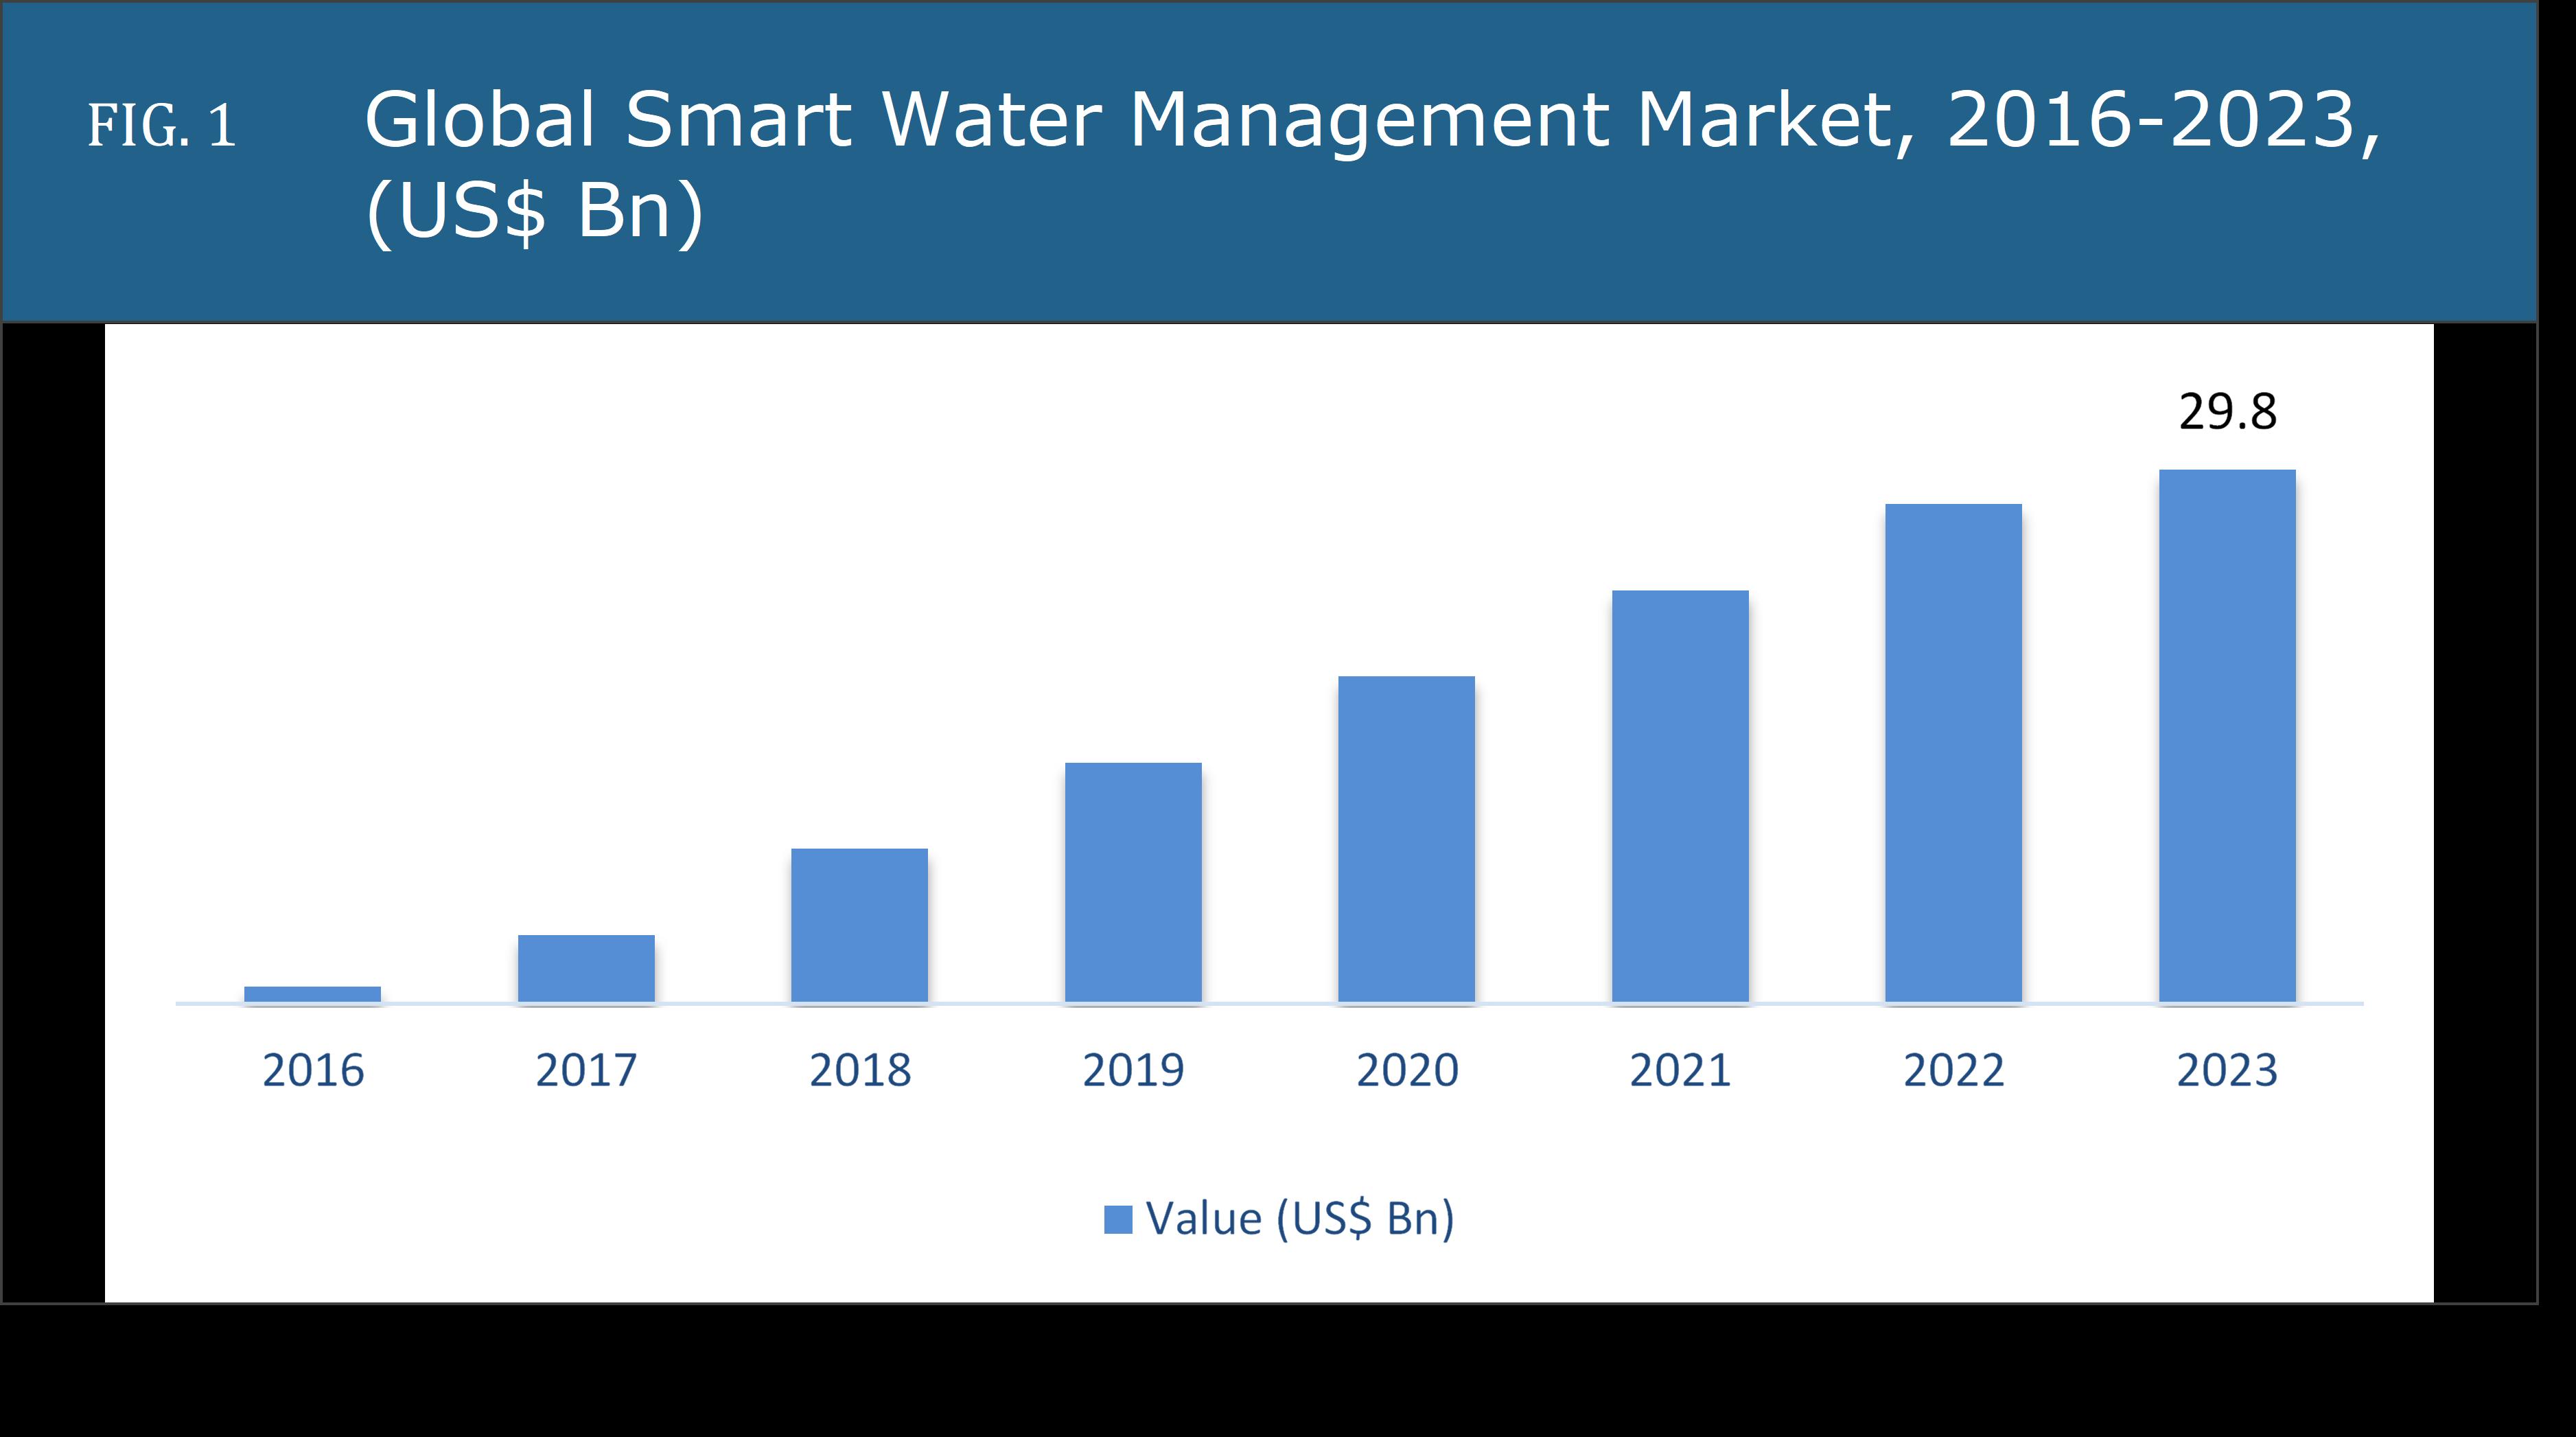 Global Smart Water Management Market